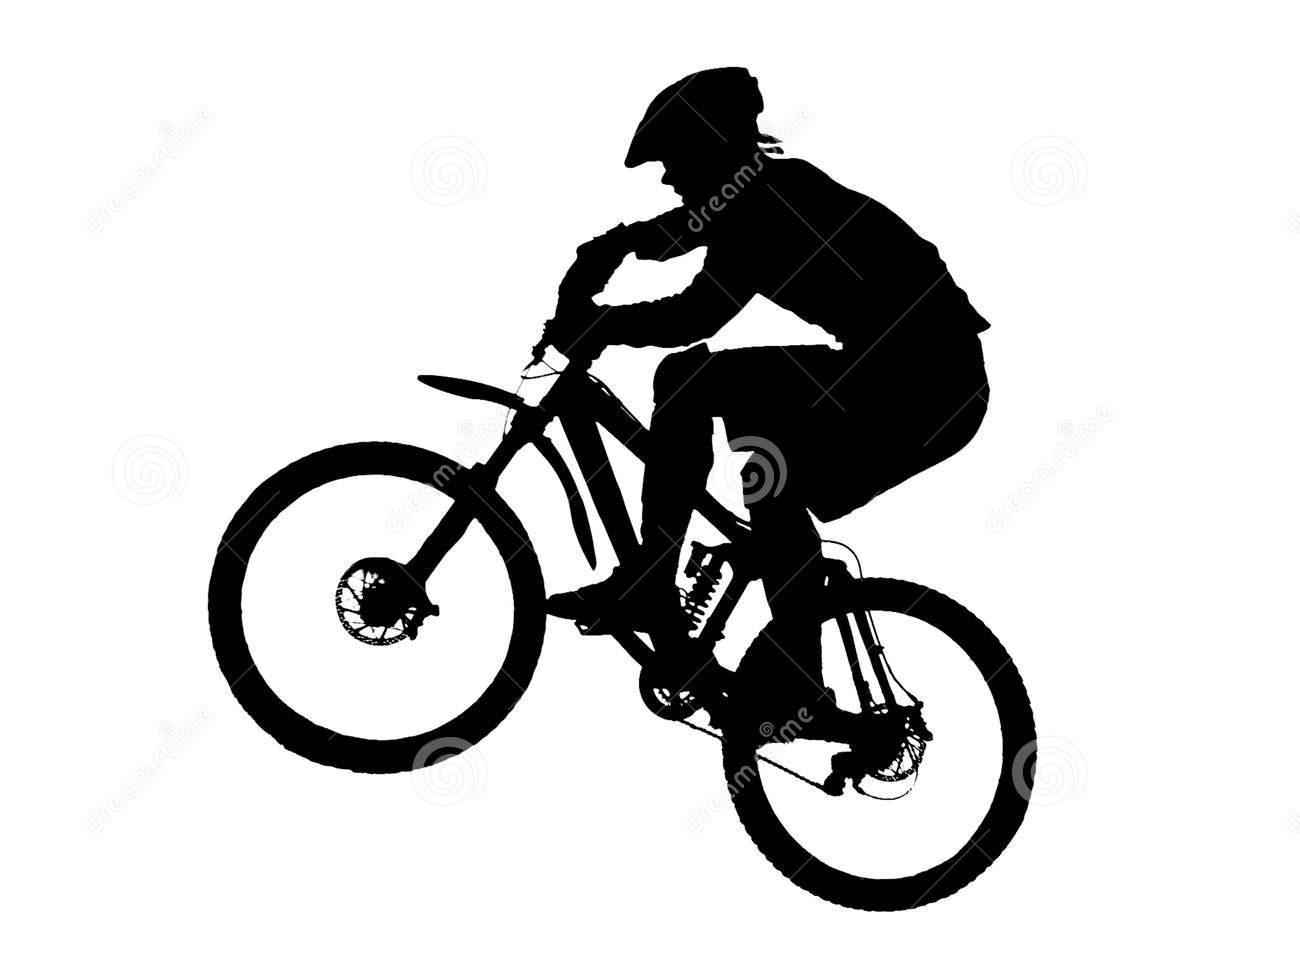 Biker clipart silhouette 4e01b25c0ae82e0b77ec4d9b3d898dfe_mountain mountain bike bike art